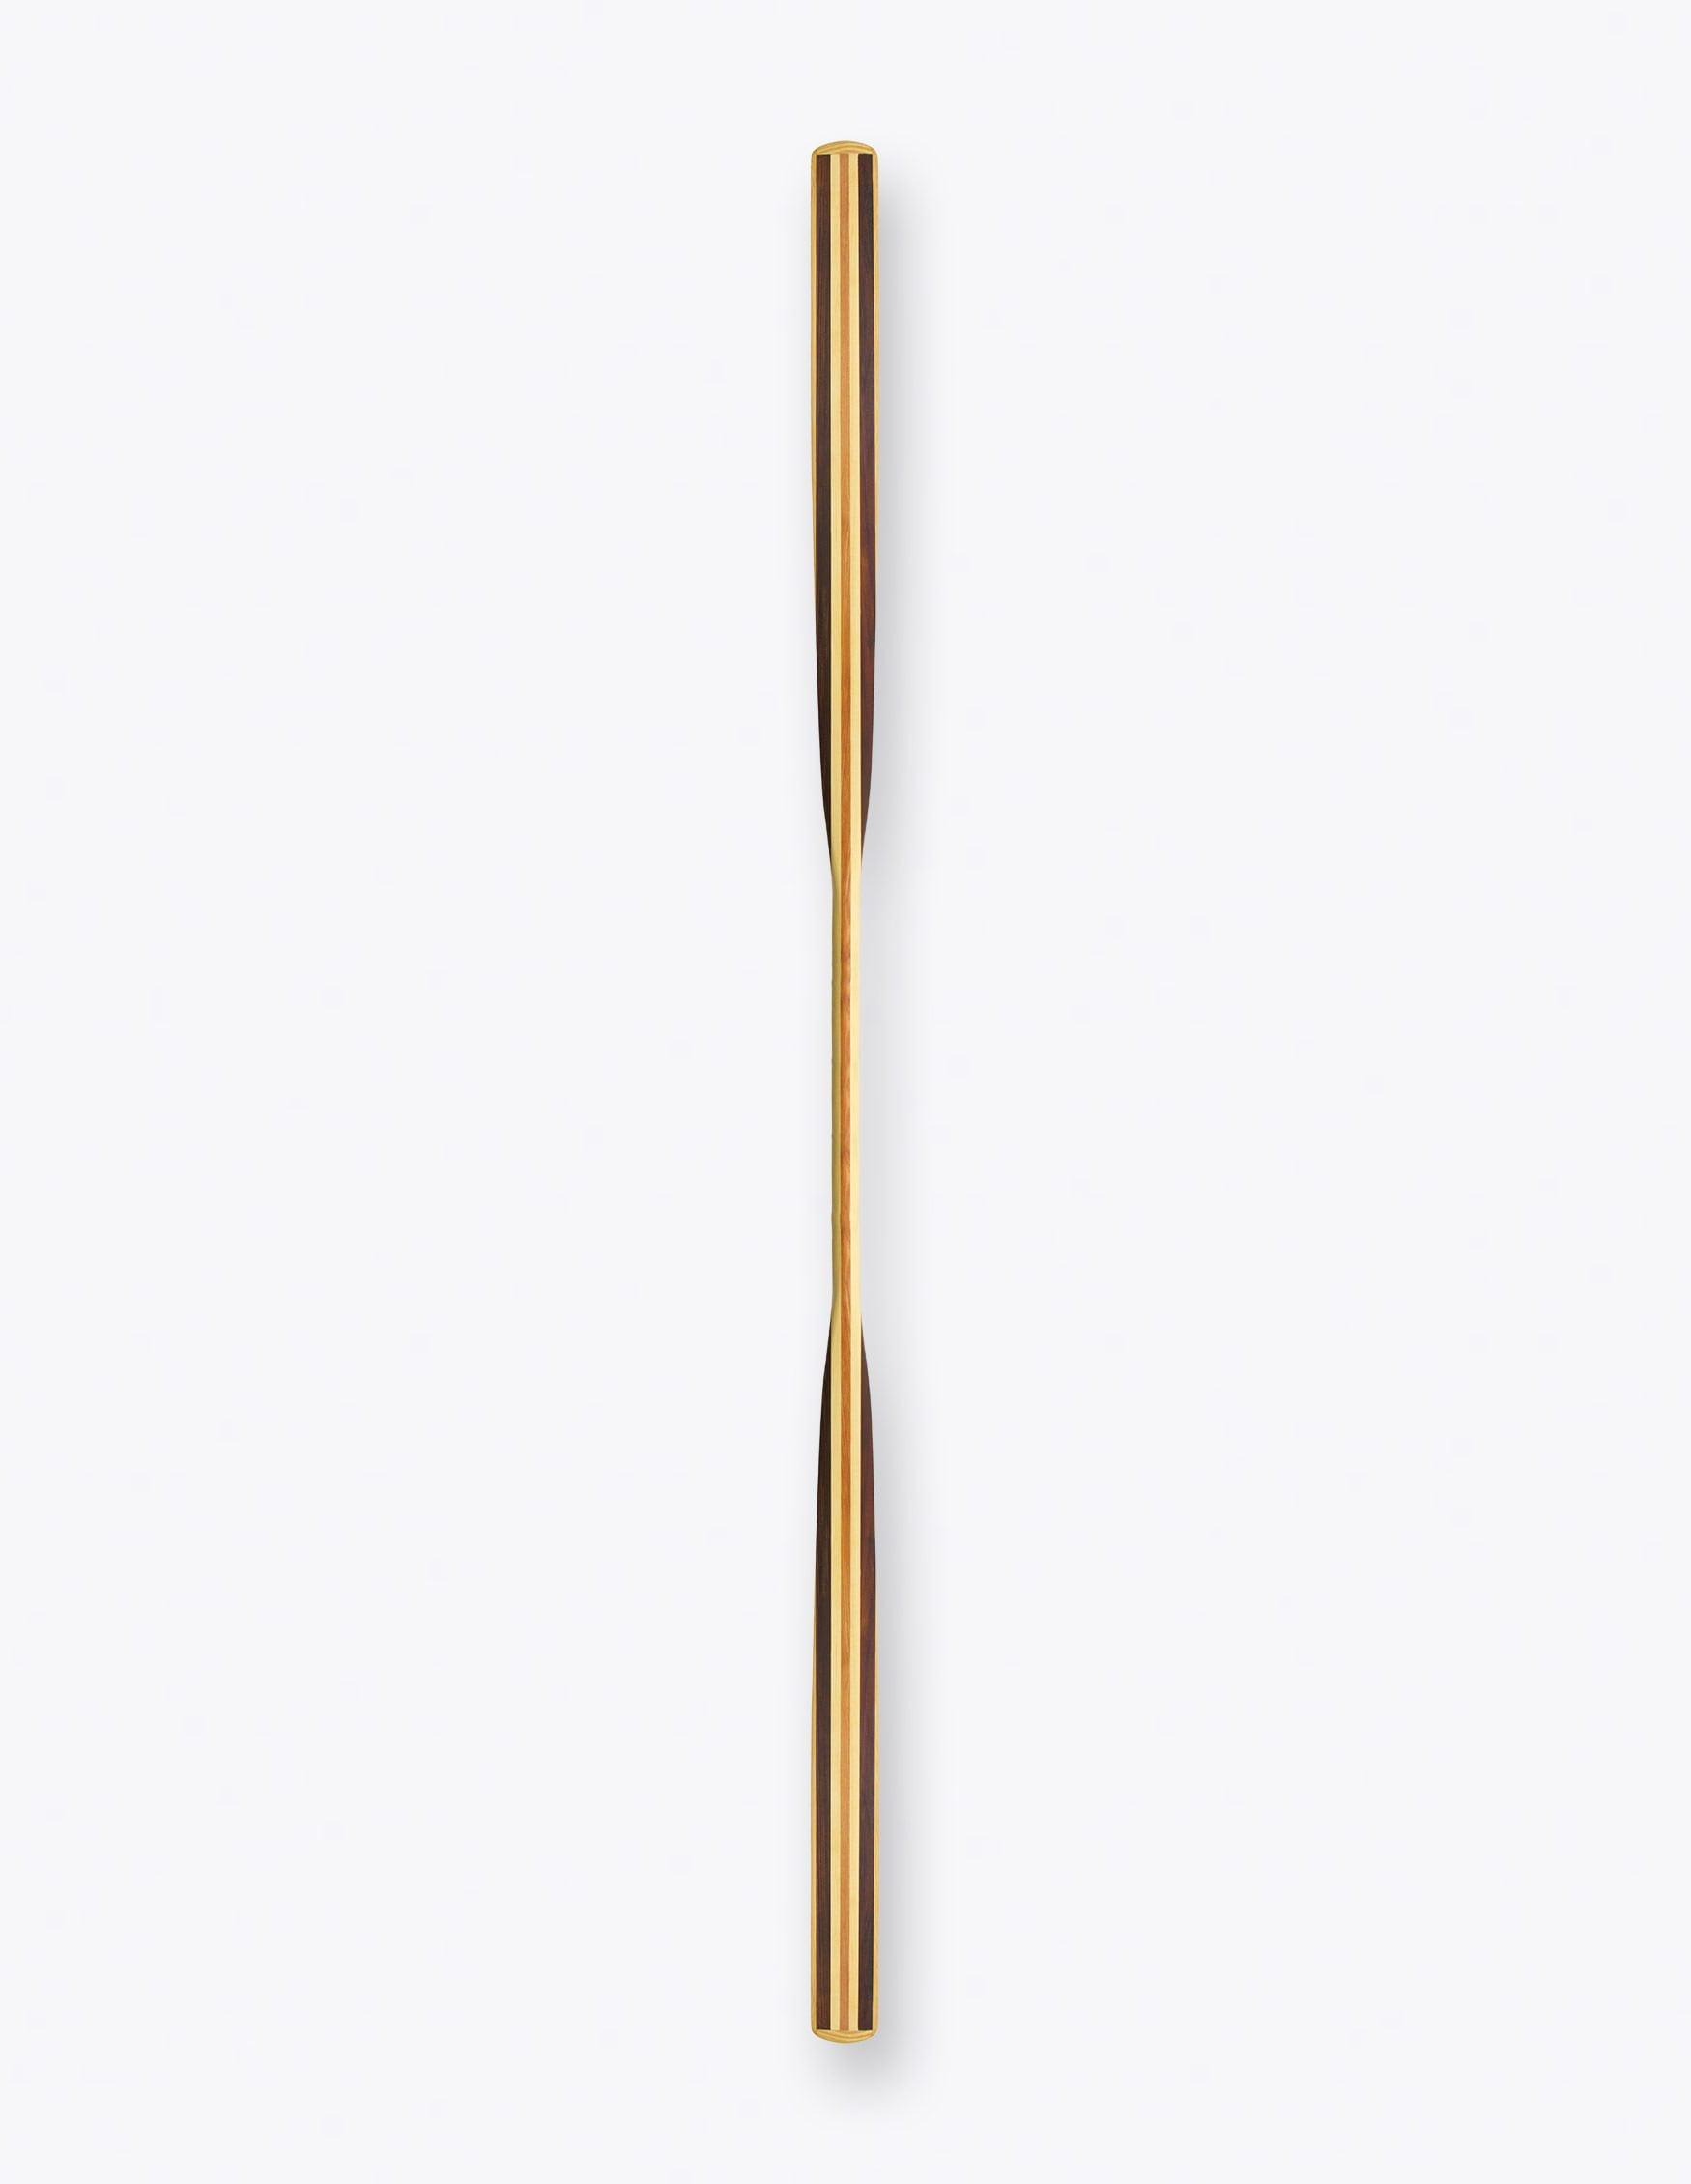 Gram paddle